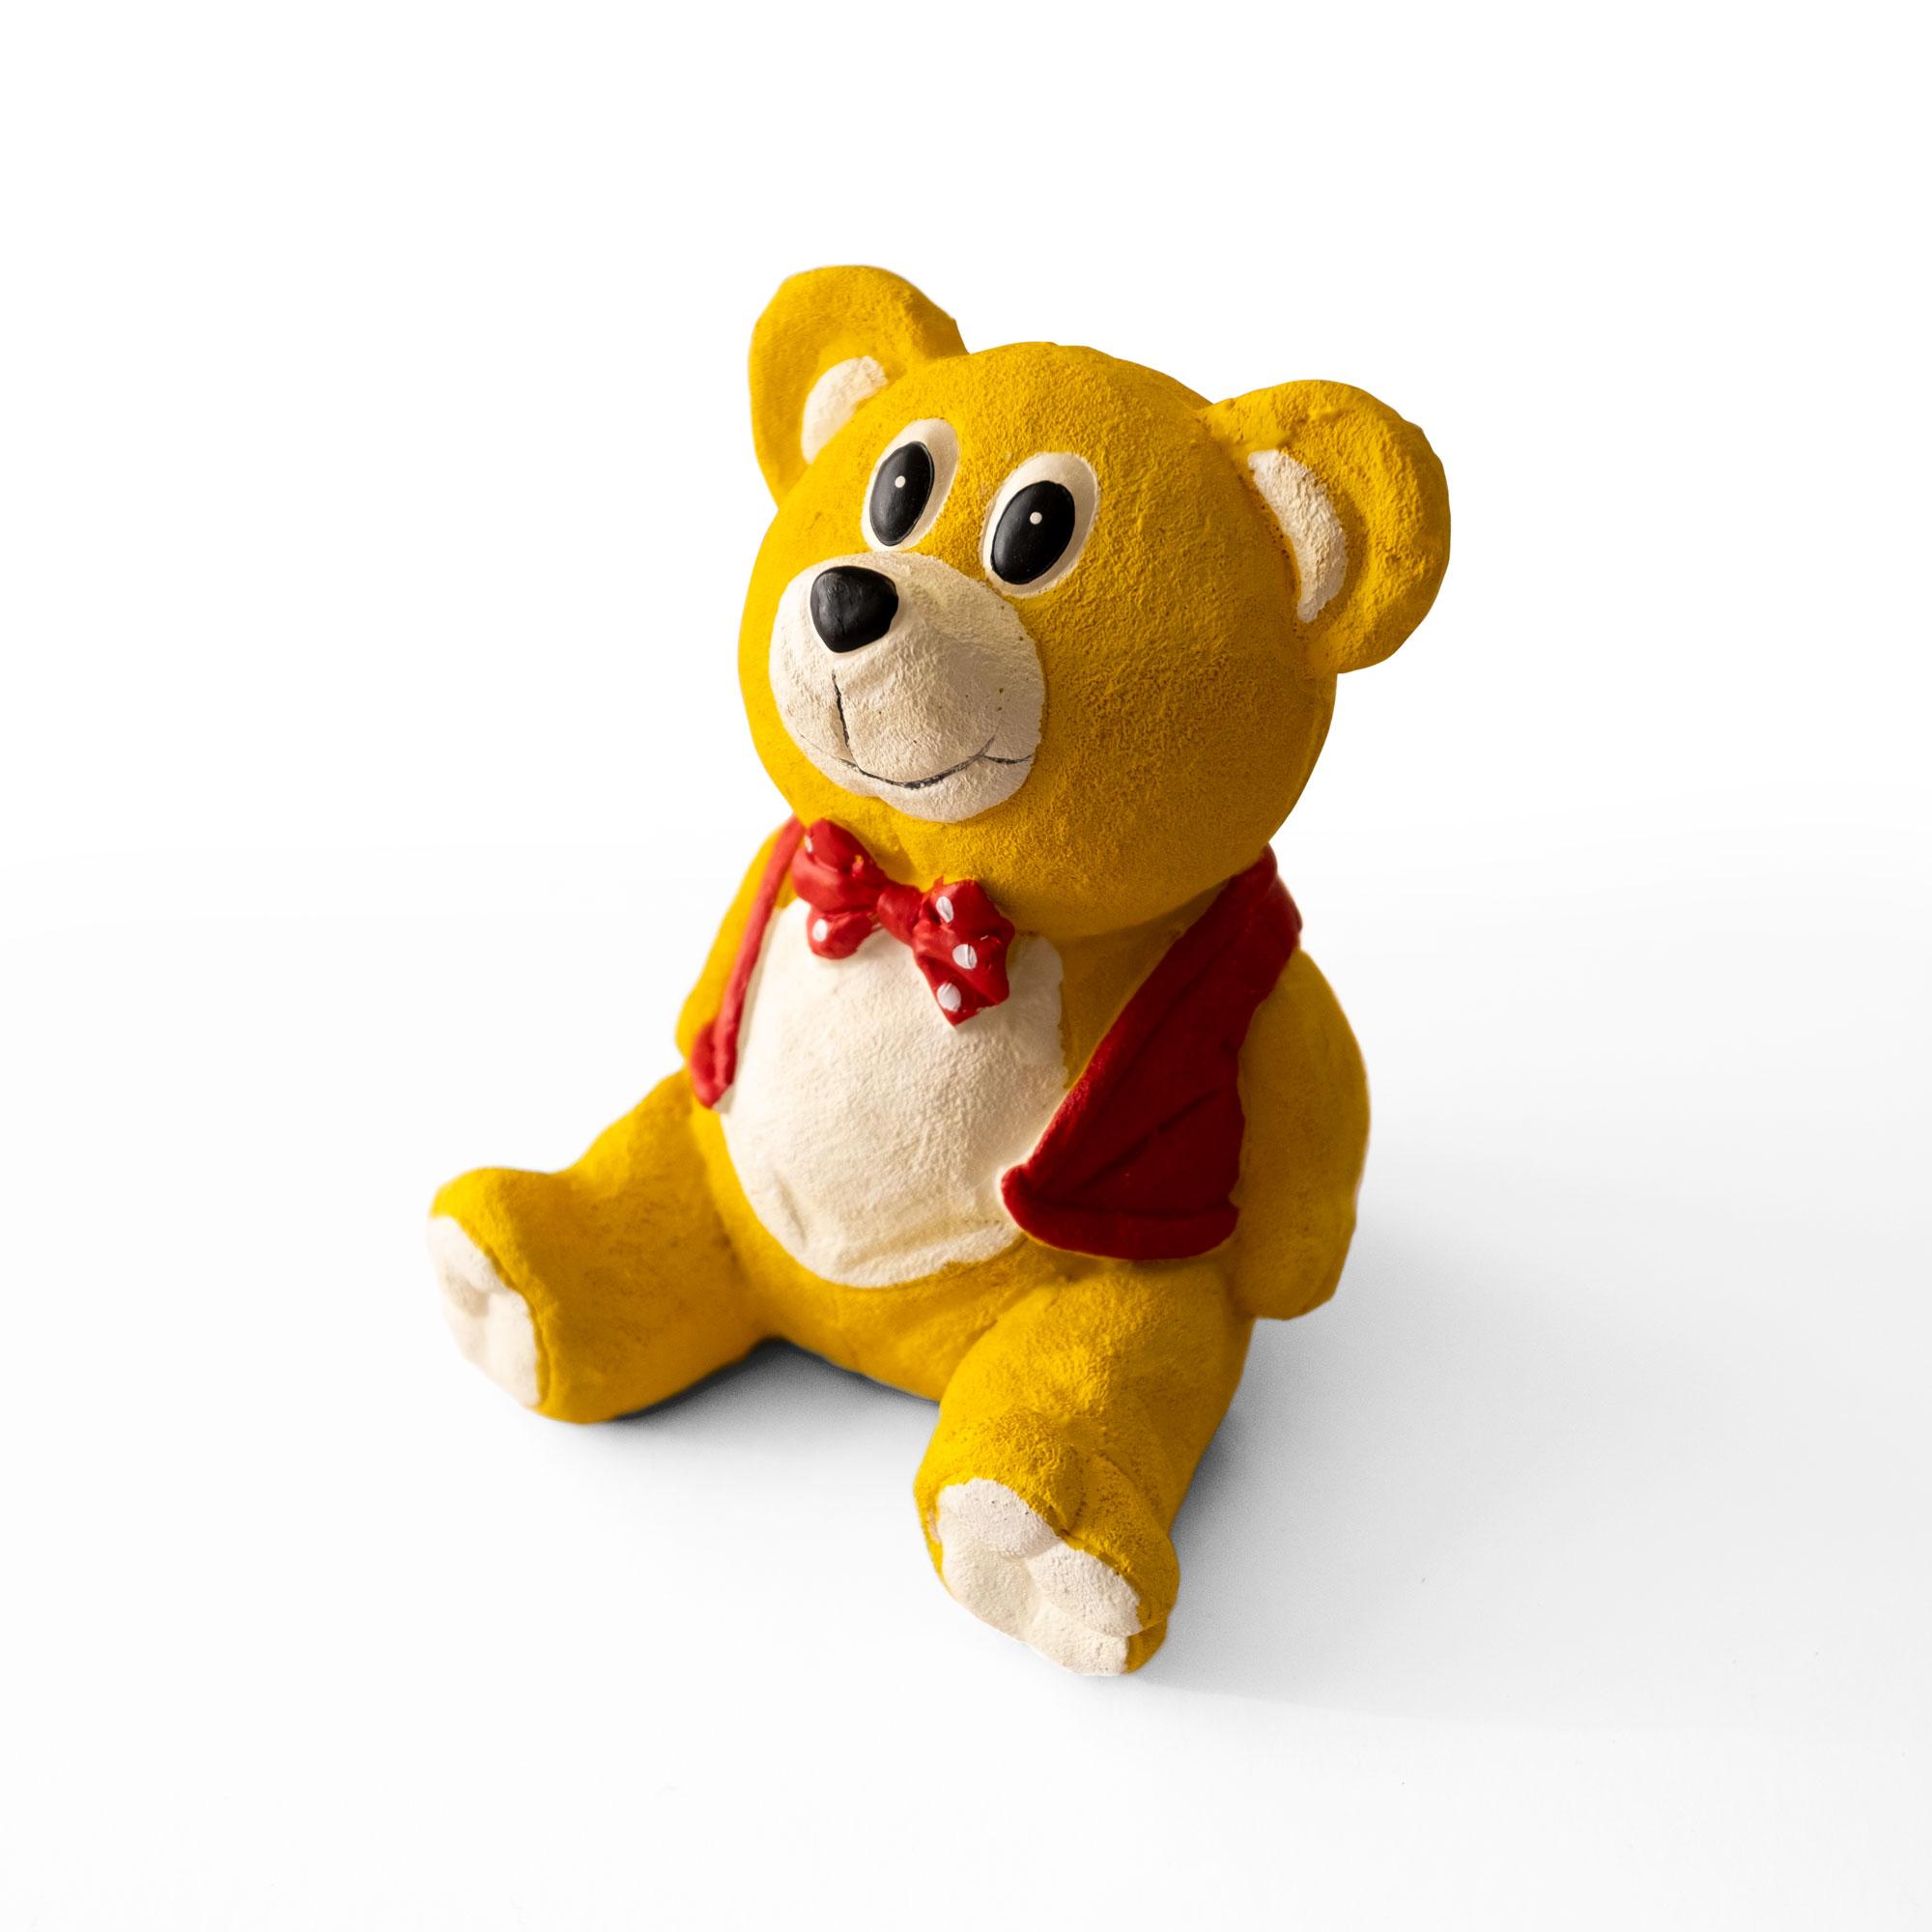 A Woolly bear soft toy